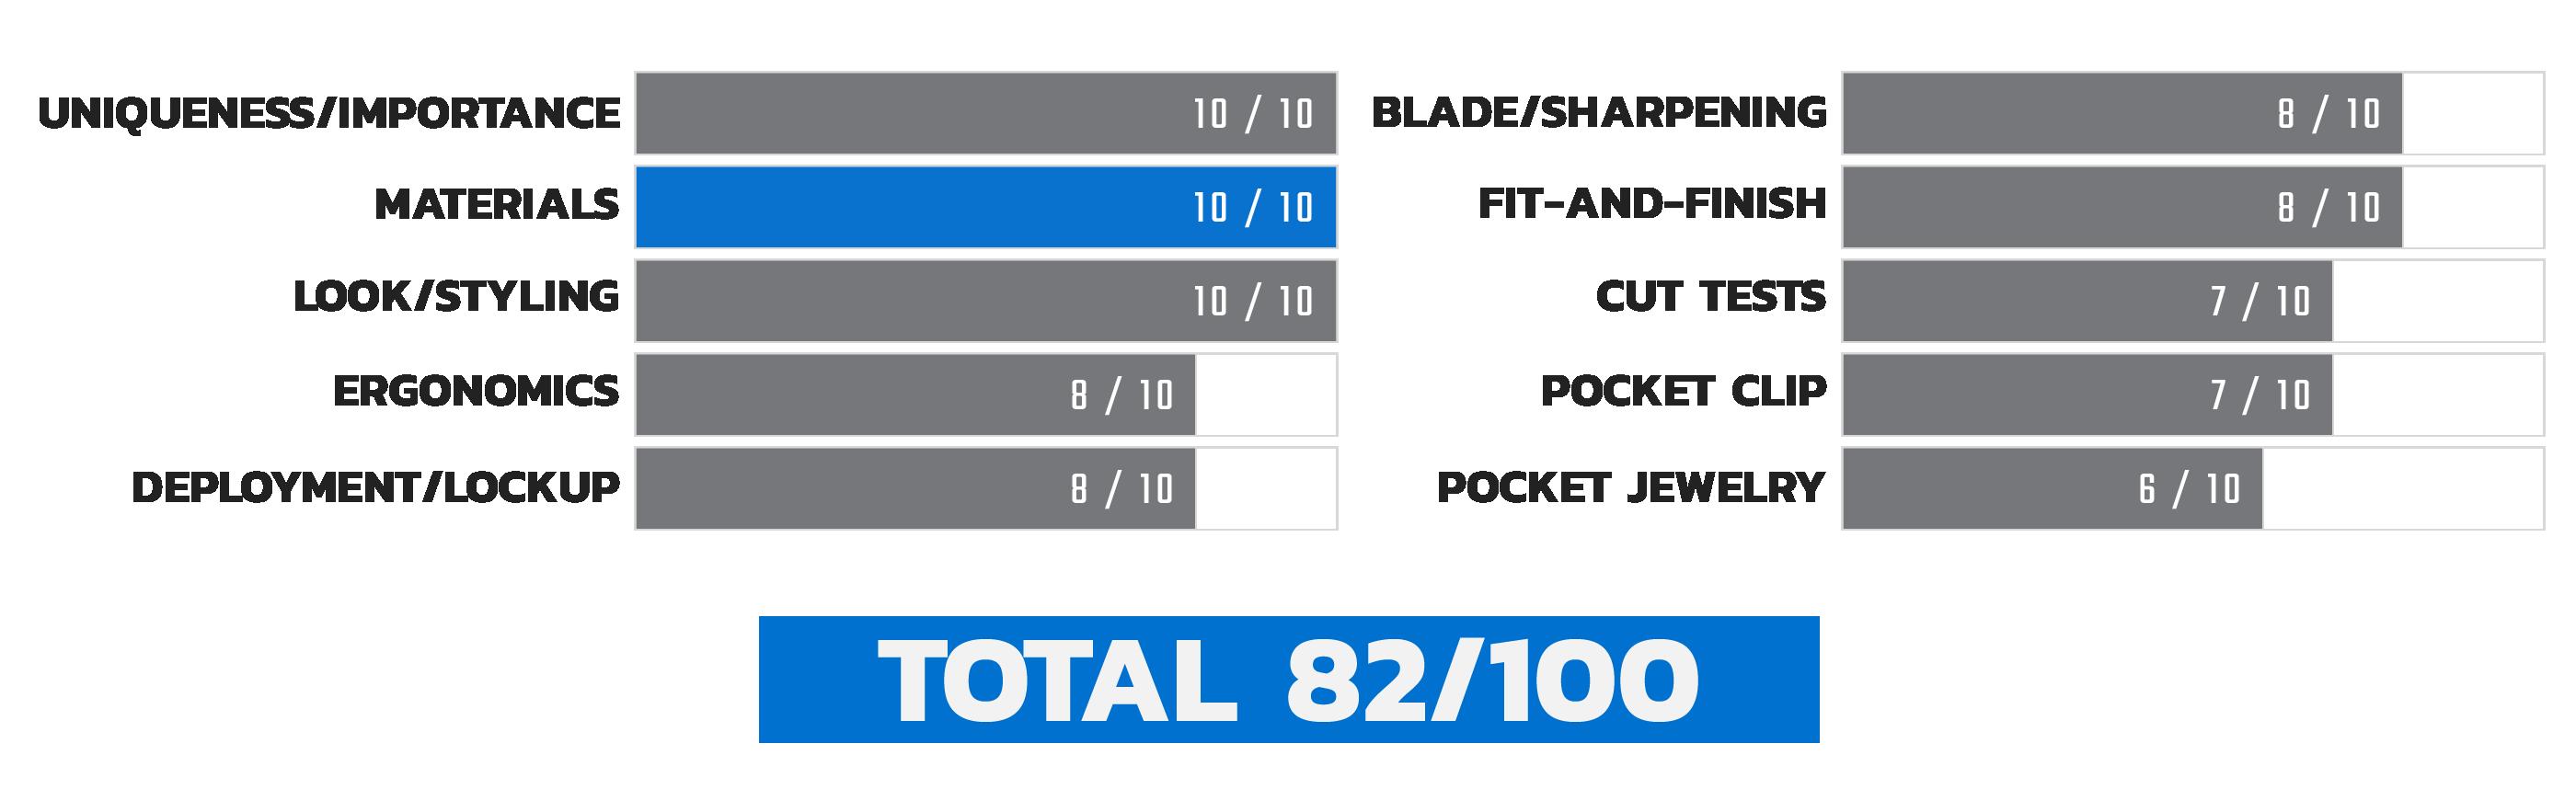 Launch 4 Materials Score Chart